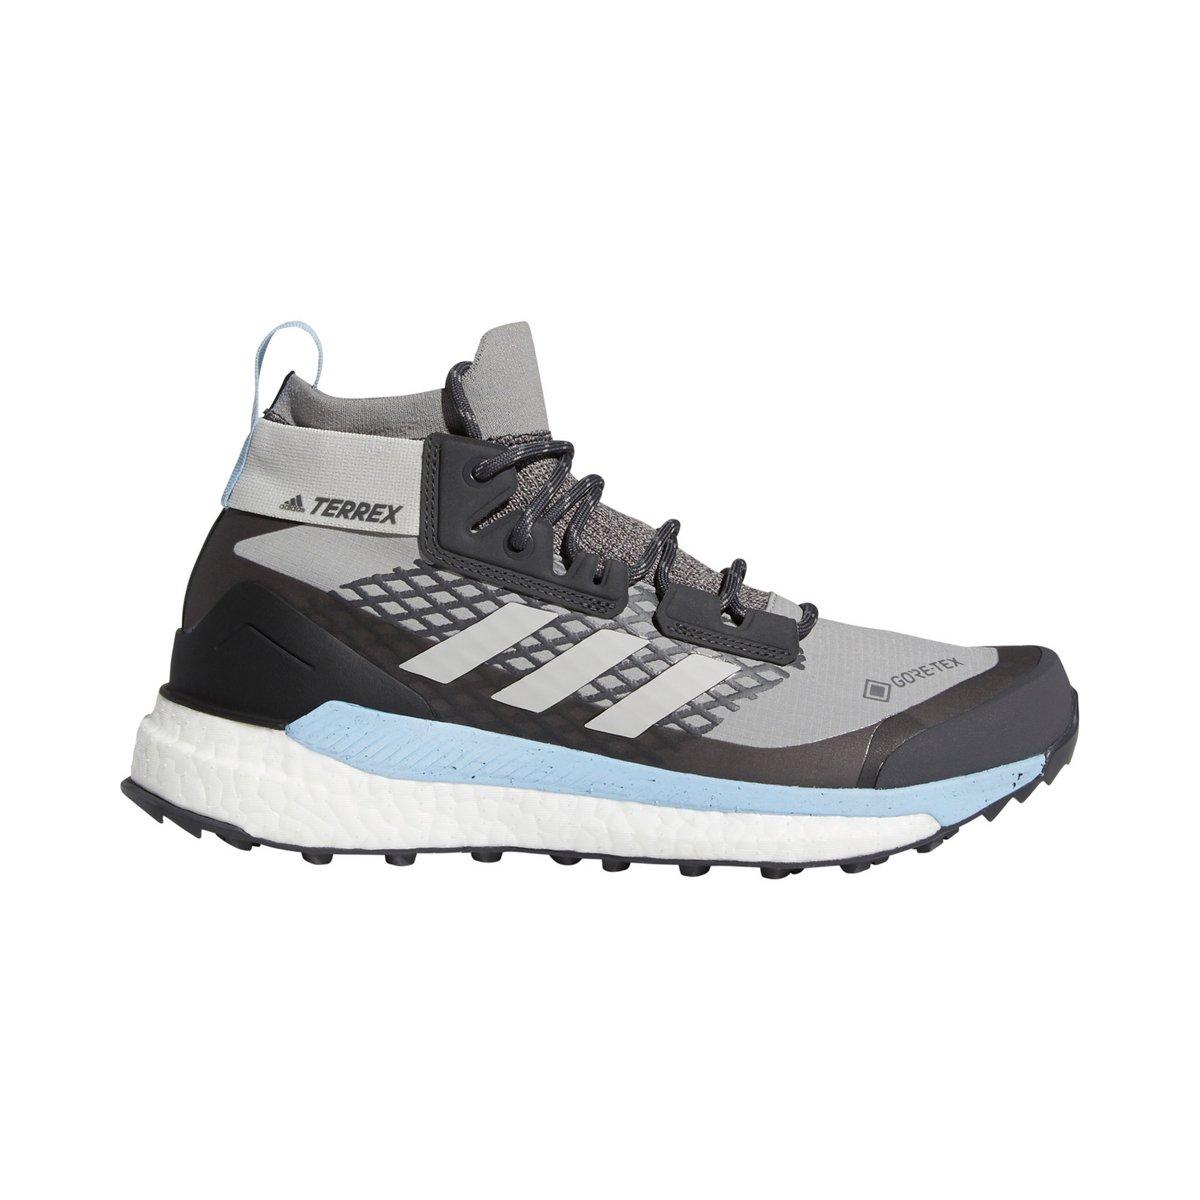 Adidas Terrex Women's Free Hiker GORE-TEX Shoes 0